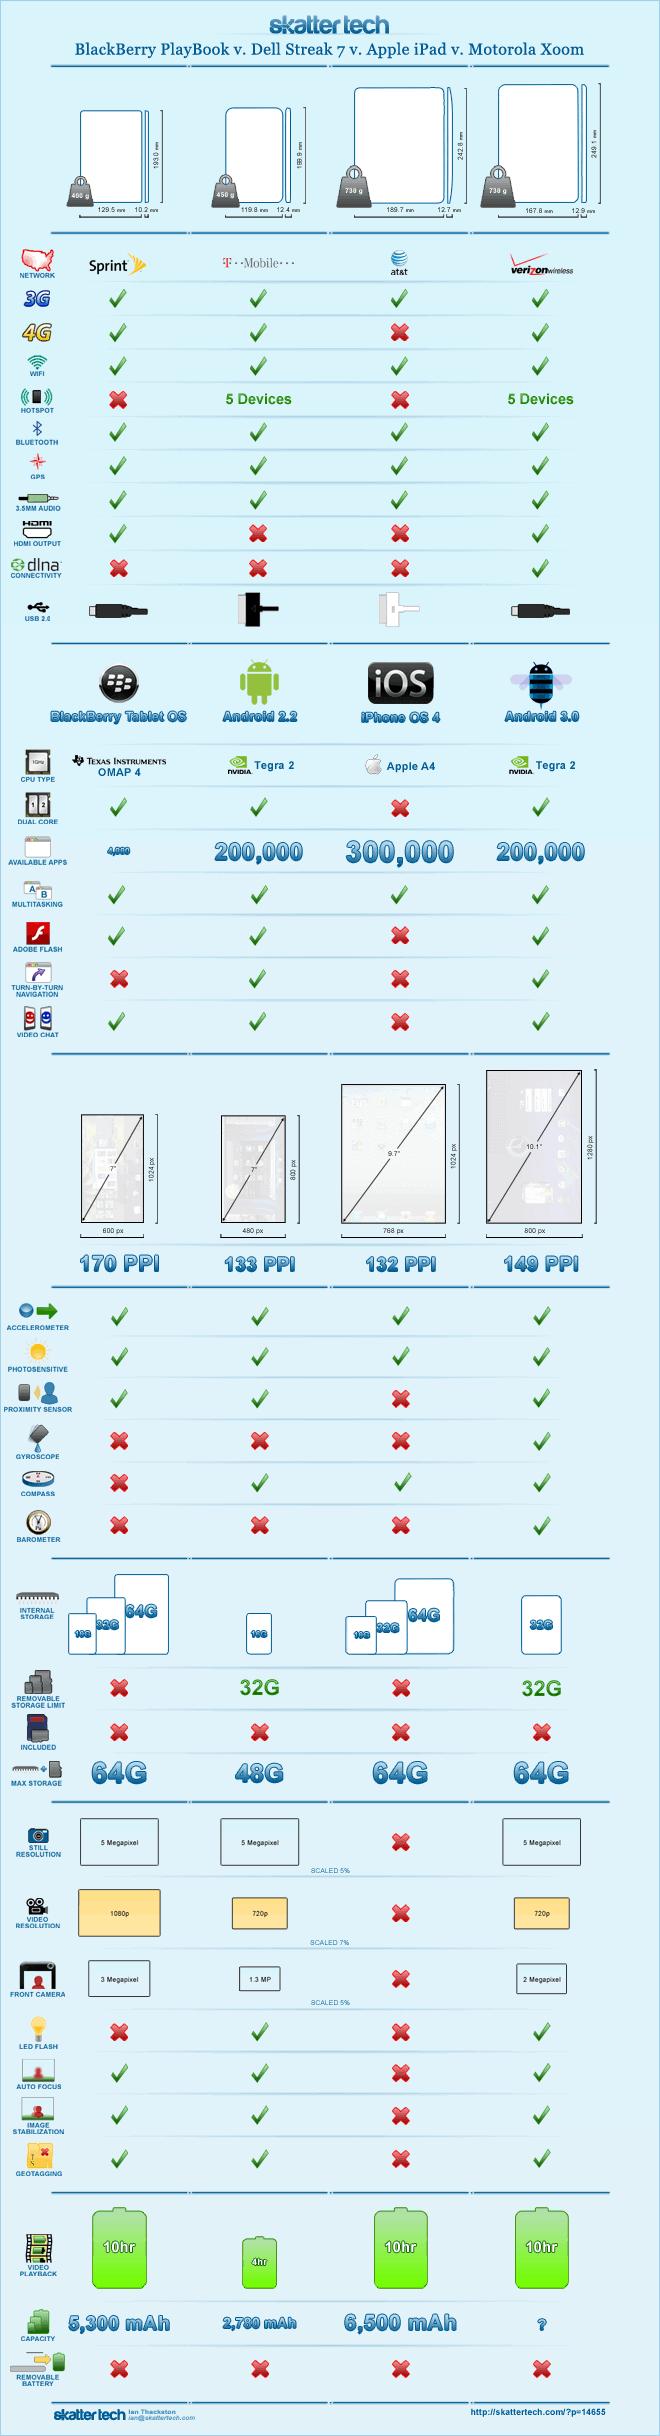 Motorola XOOM vs Everyone Else Infographic